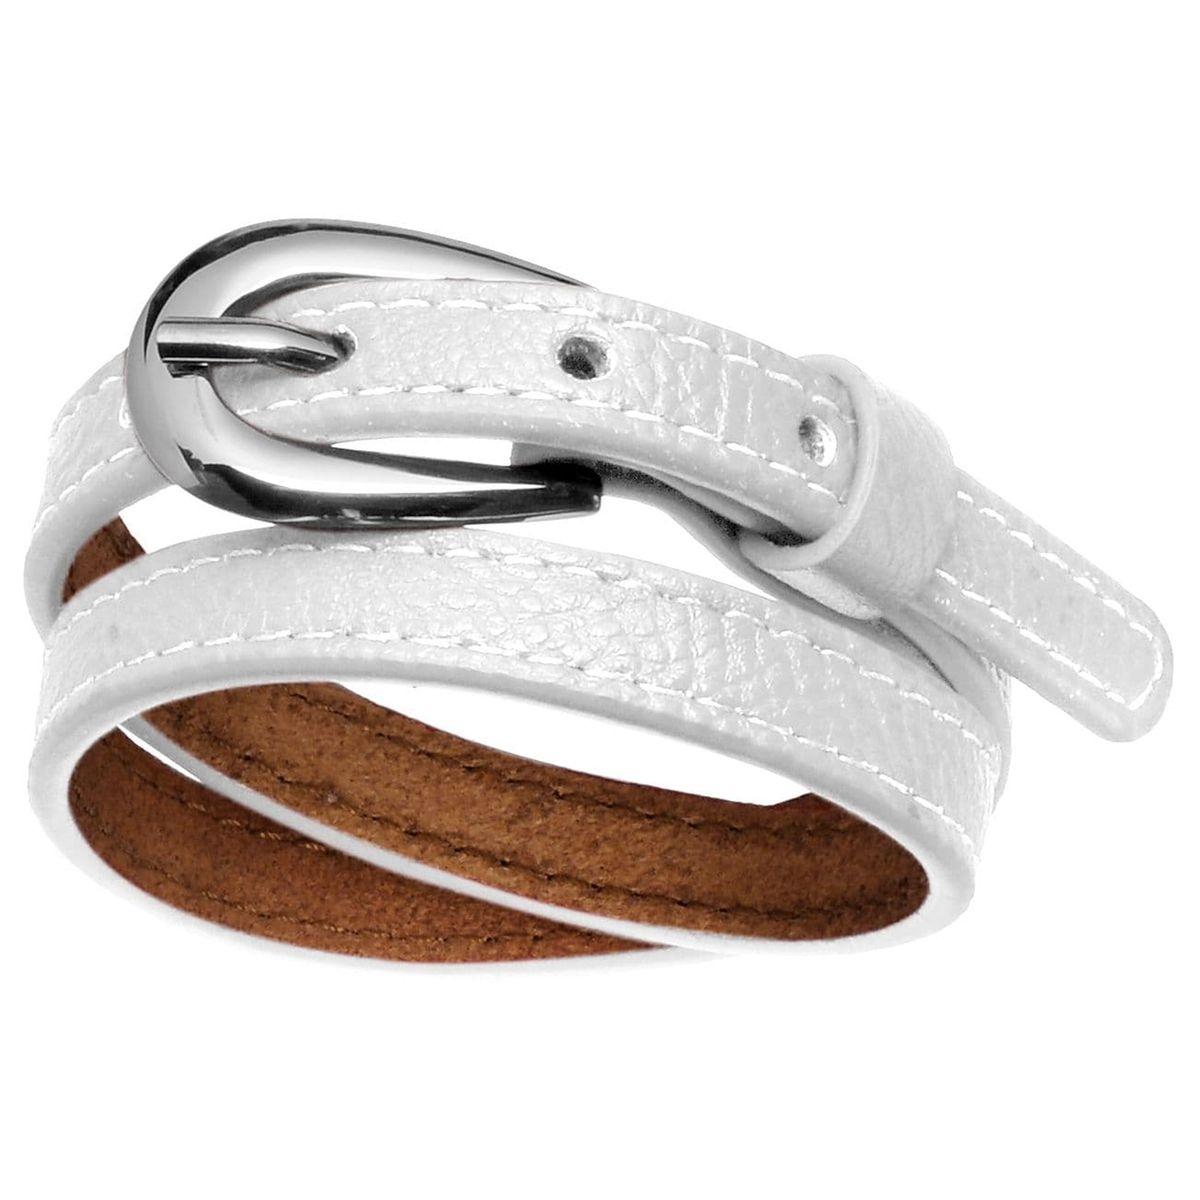 Bracelet 2 Rangs Fermeture Boucle Ceinture Cuir Acier